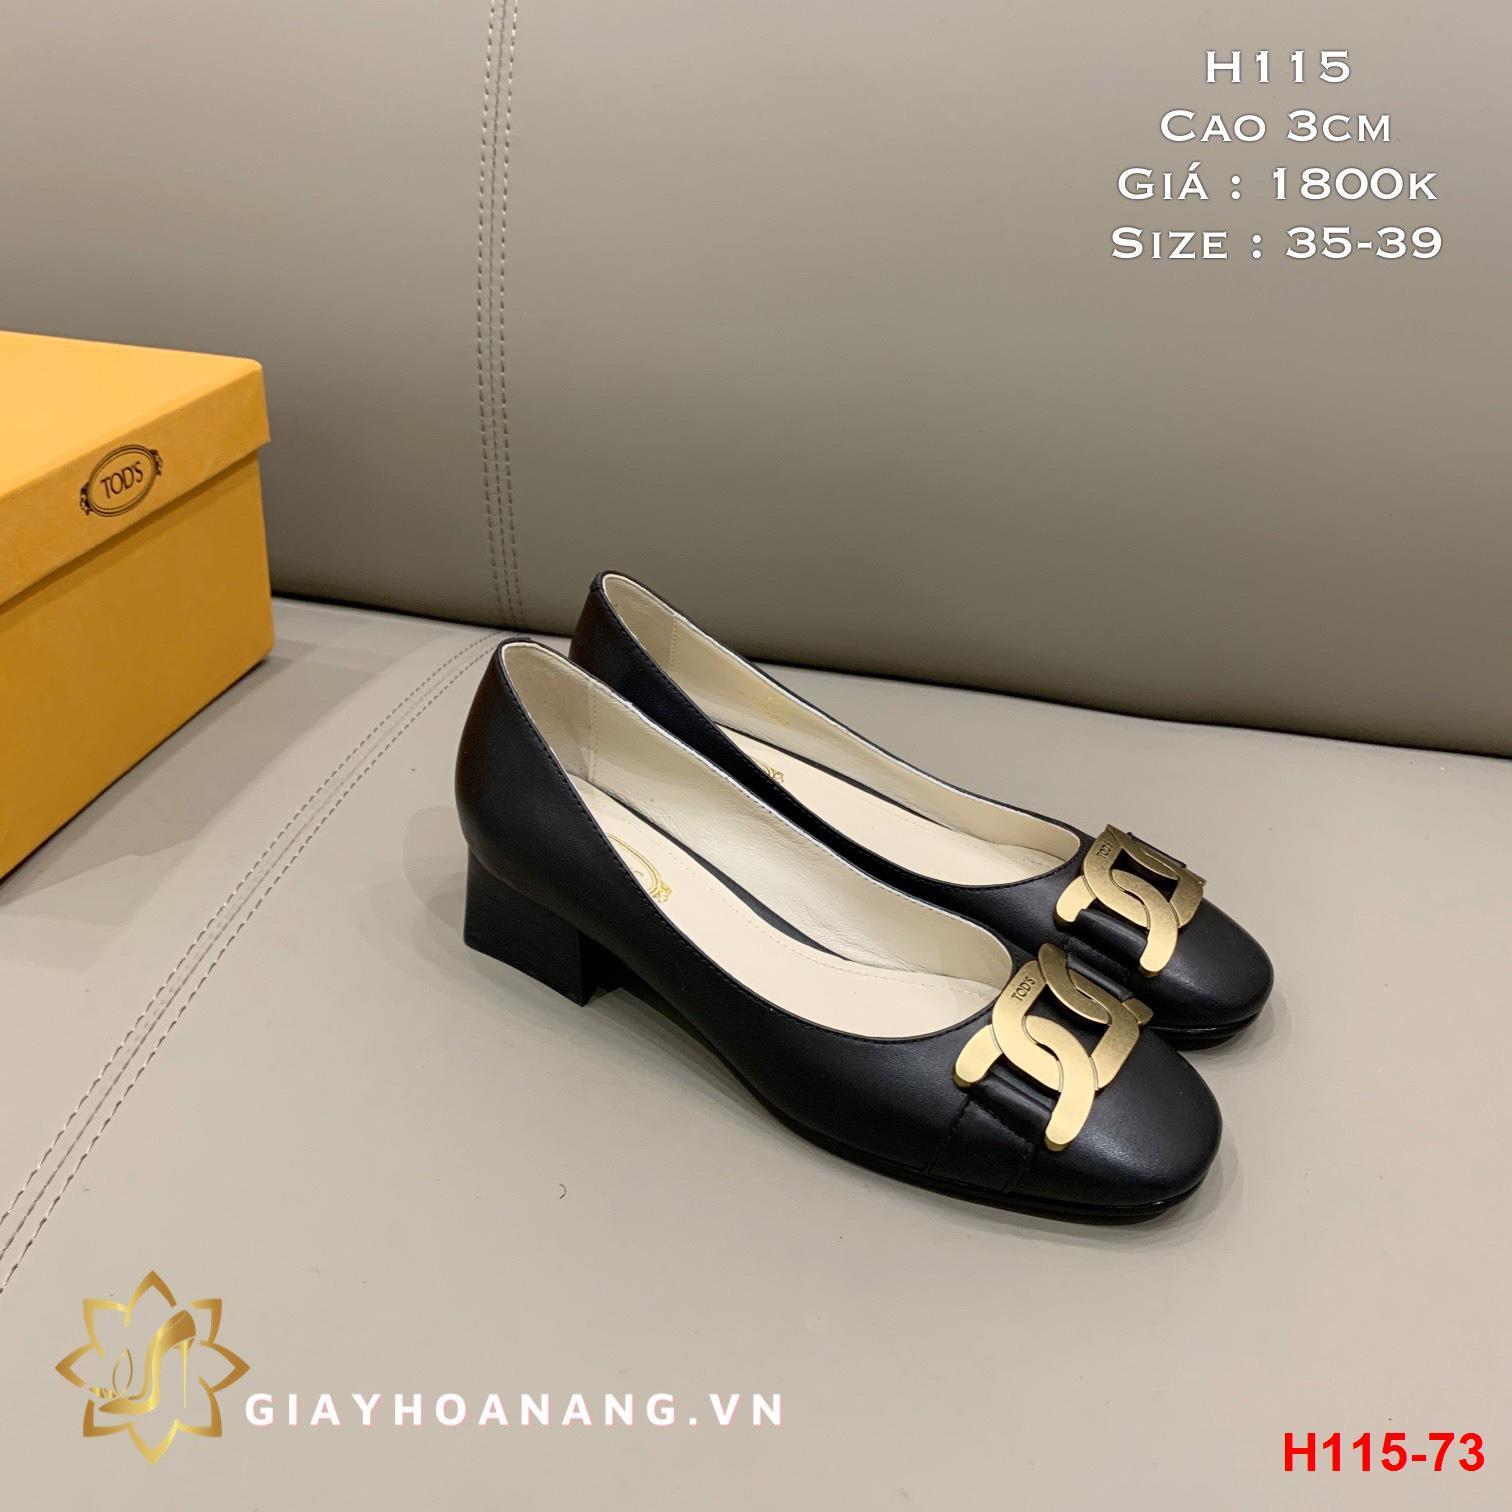 H115-73 Tods giày cao 3cm siêu cấp